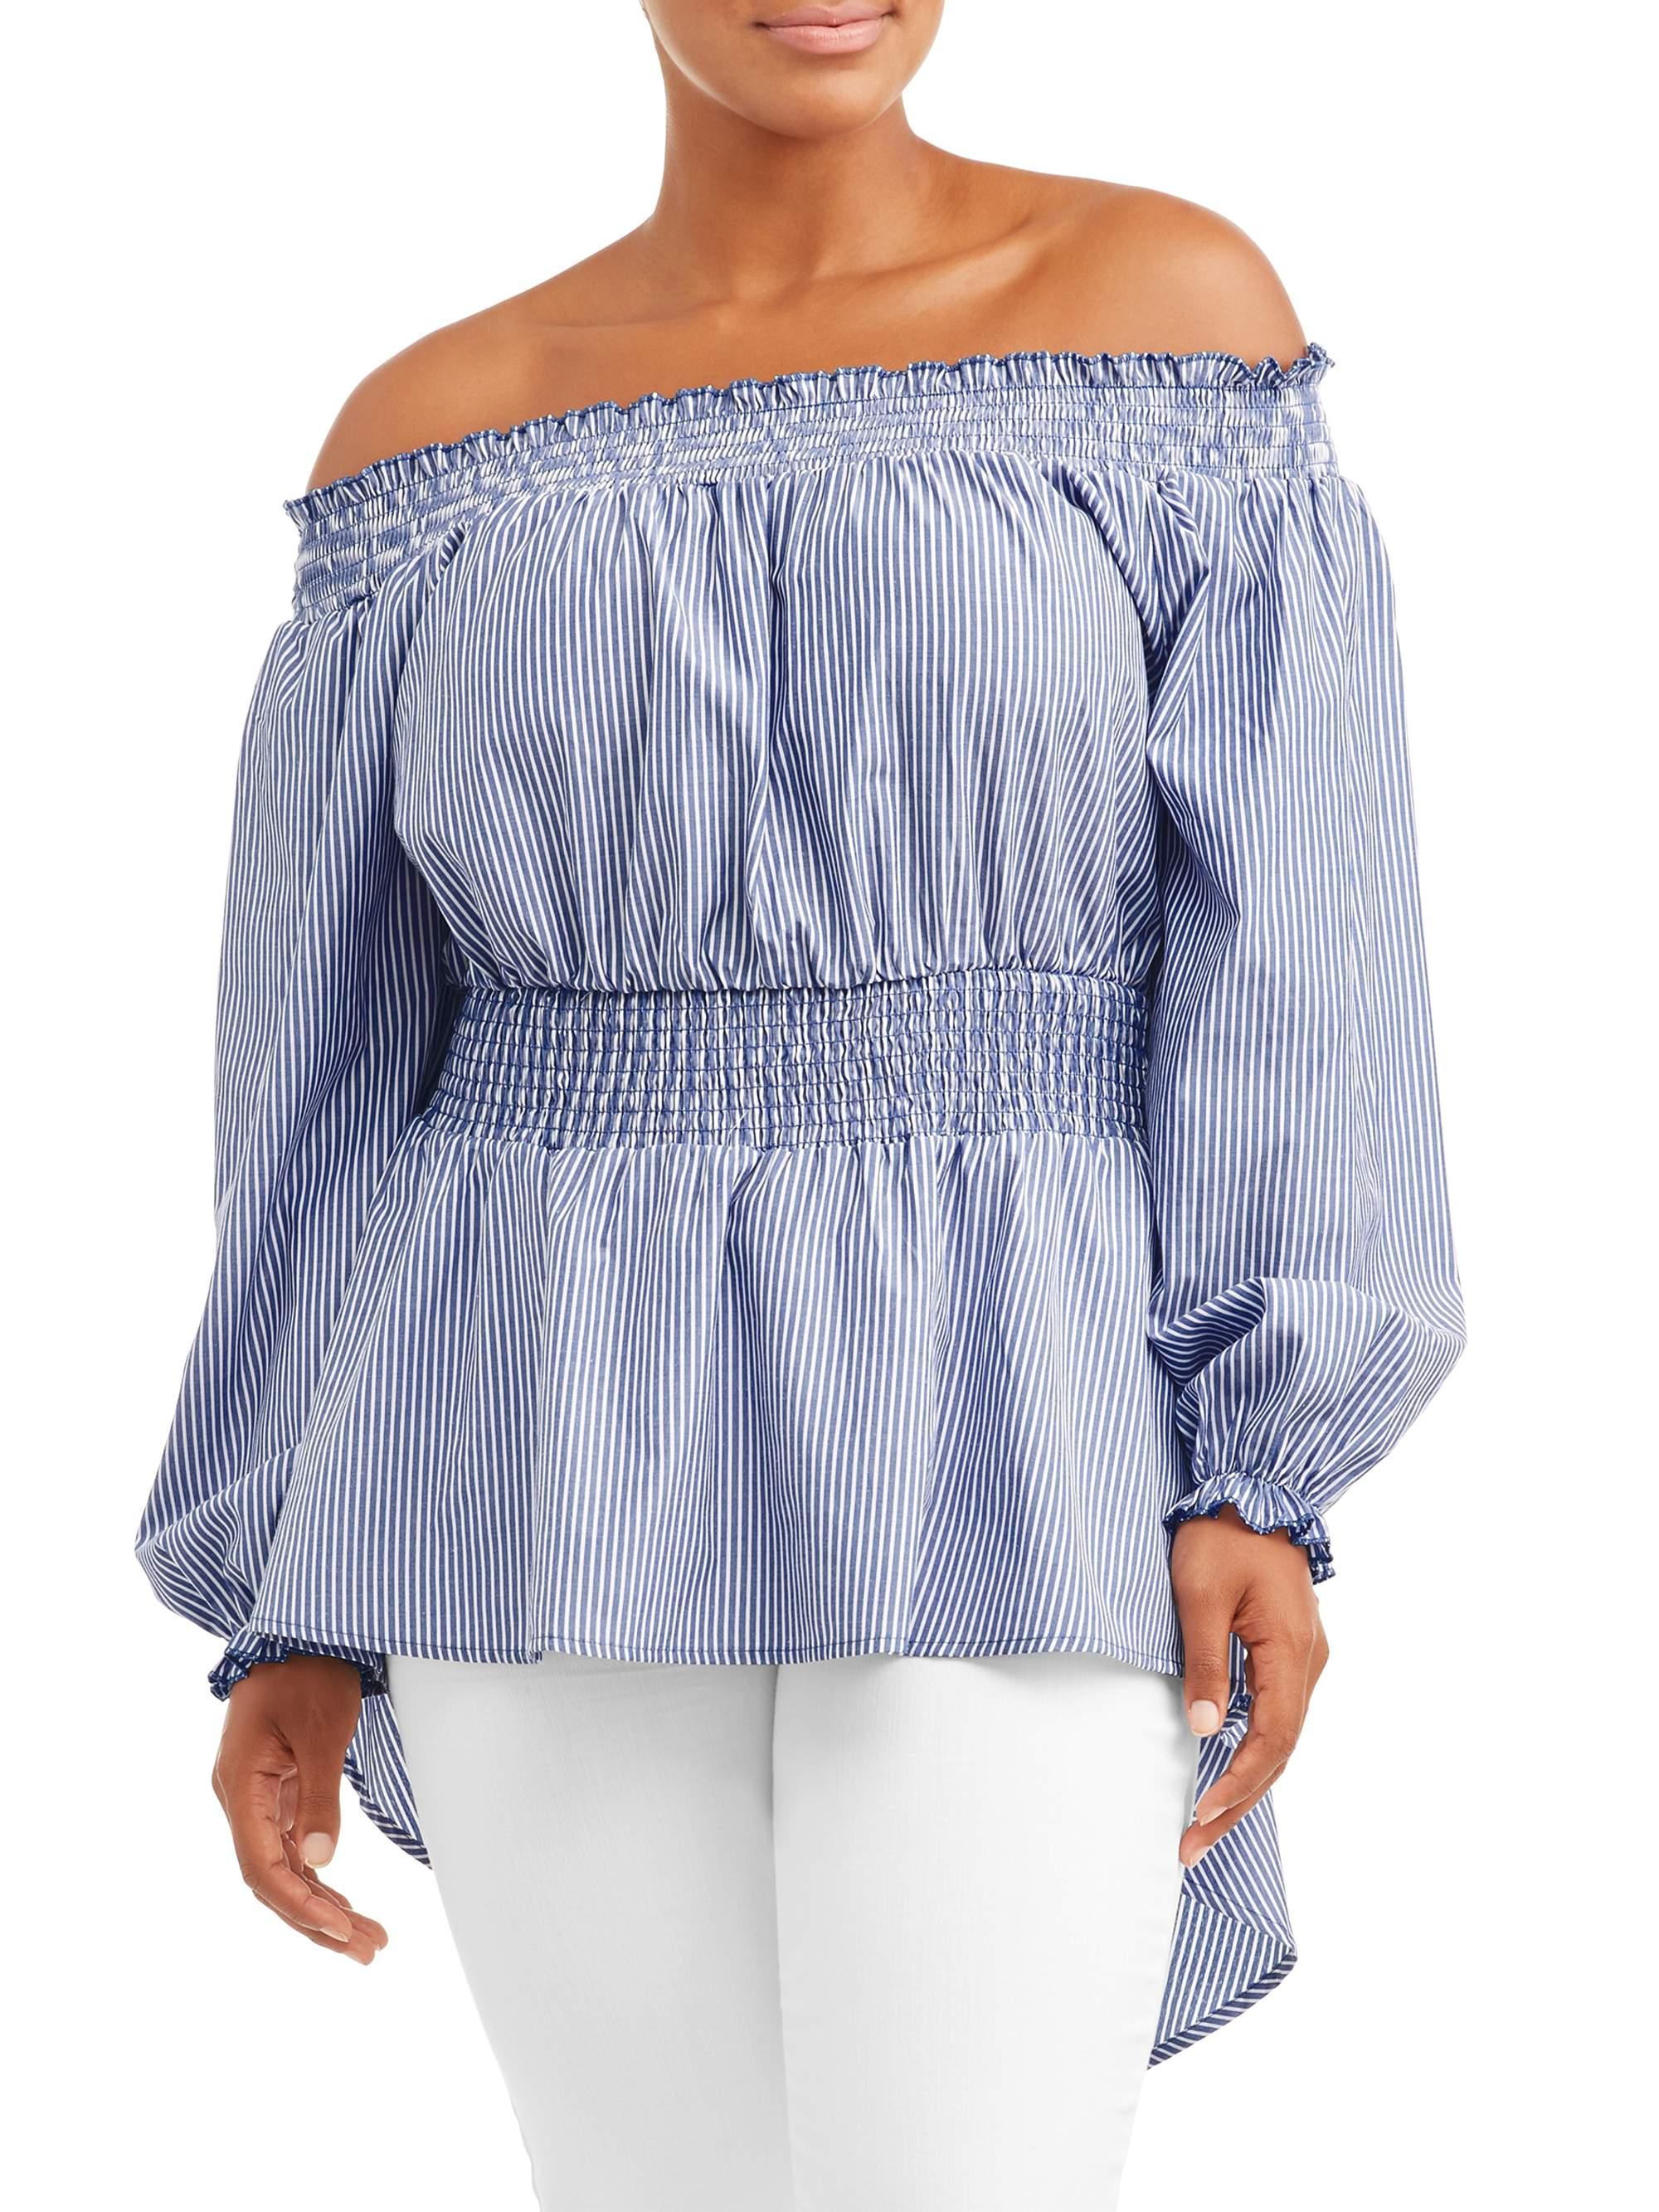 Women's Plus Size Striped Peasant Top Blouse